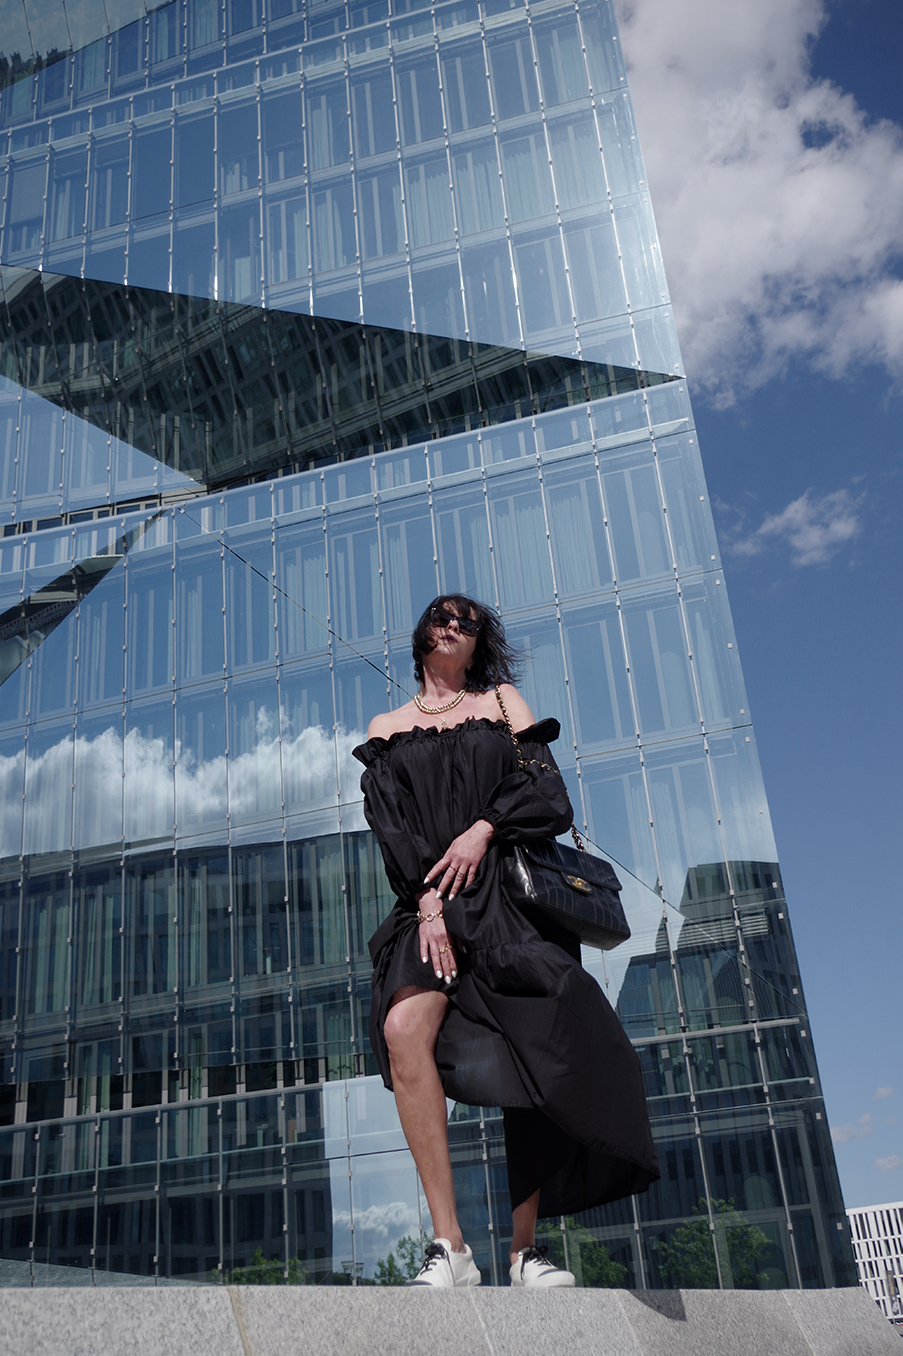 Just-take-a-look Berlin - Modestandort Berlin - Off-Shoulder Kleid